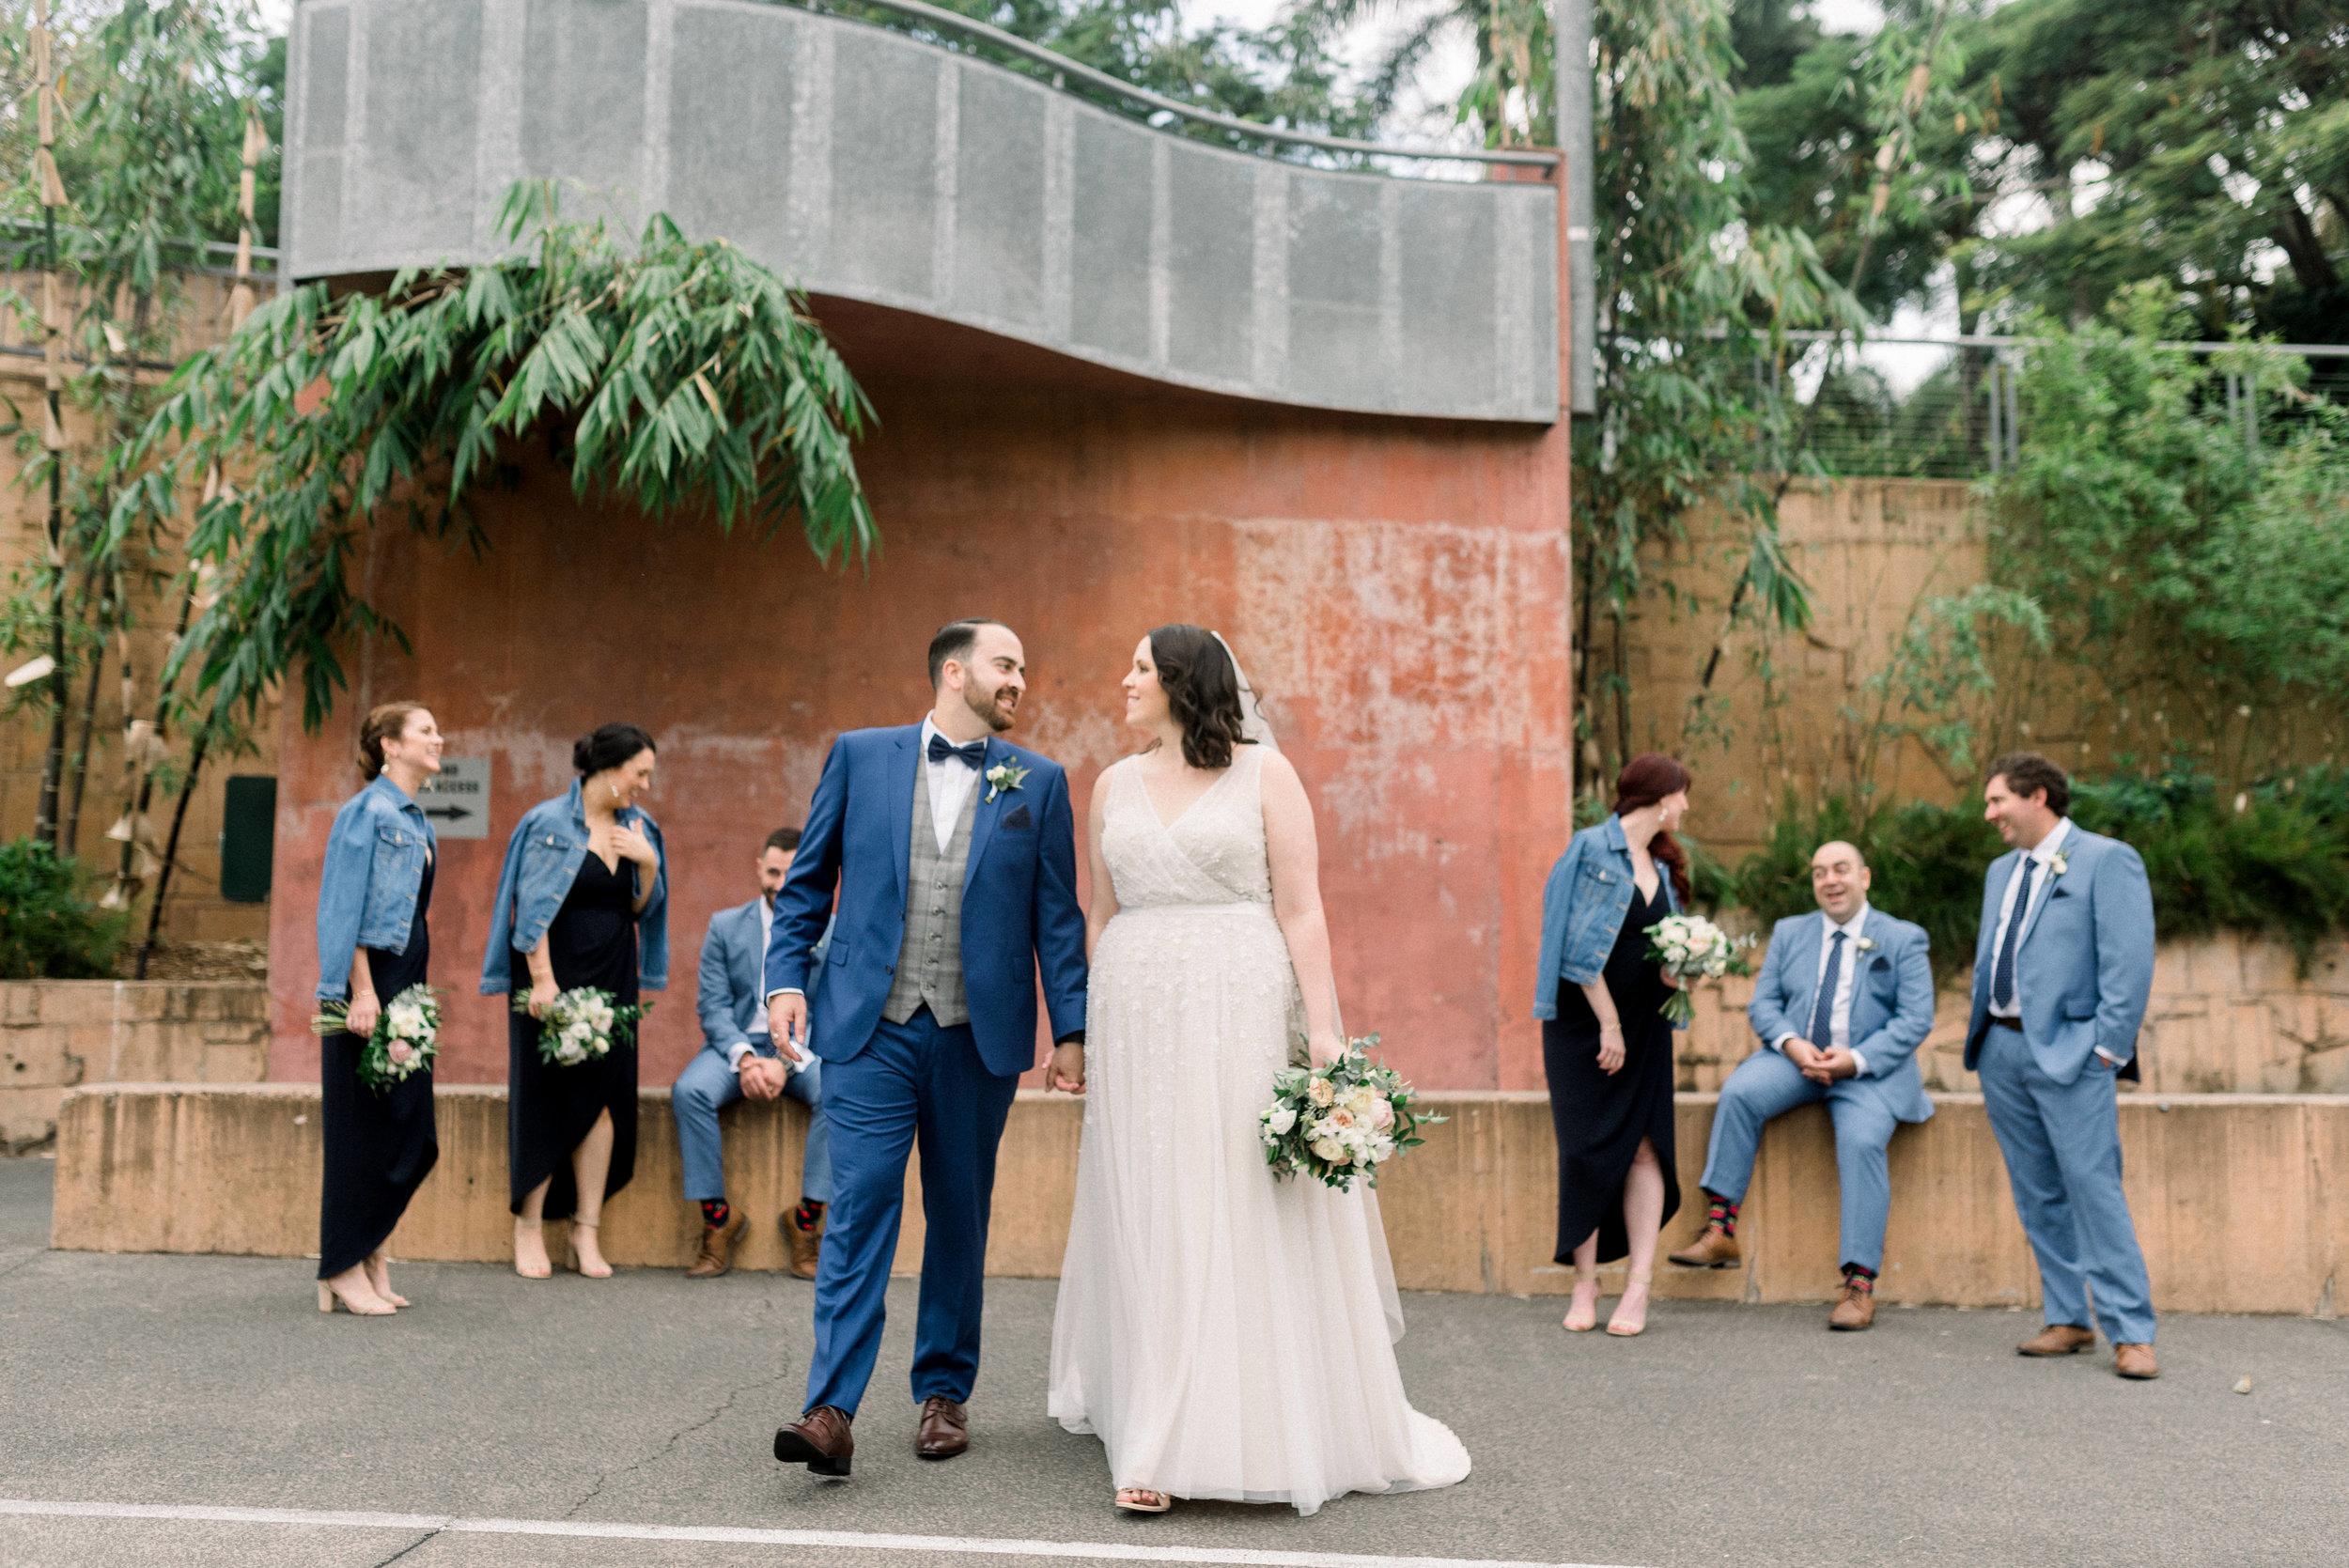 brisbane-city-wedding-photographer-romantic-wedding-72.jpg